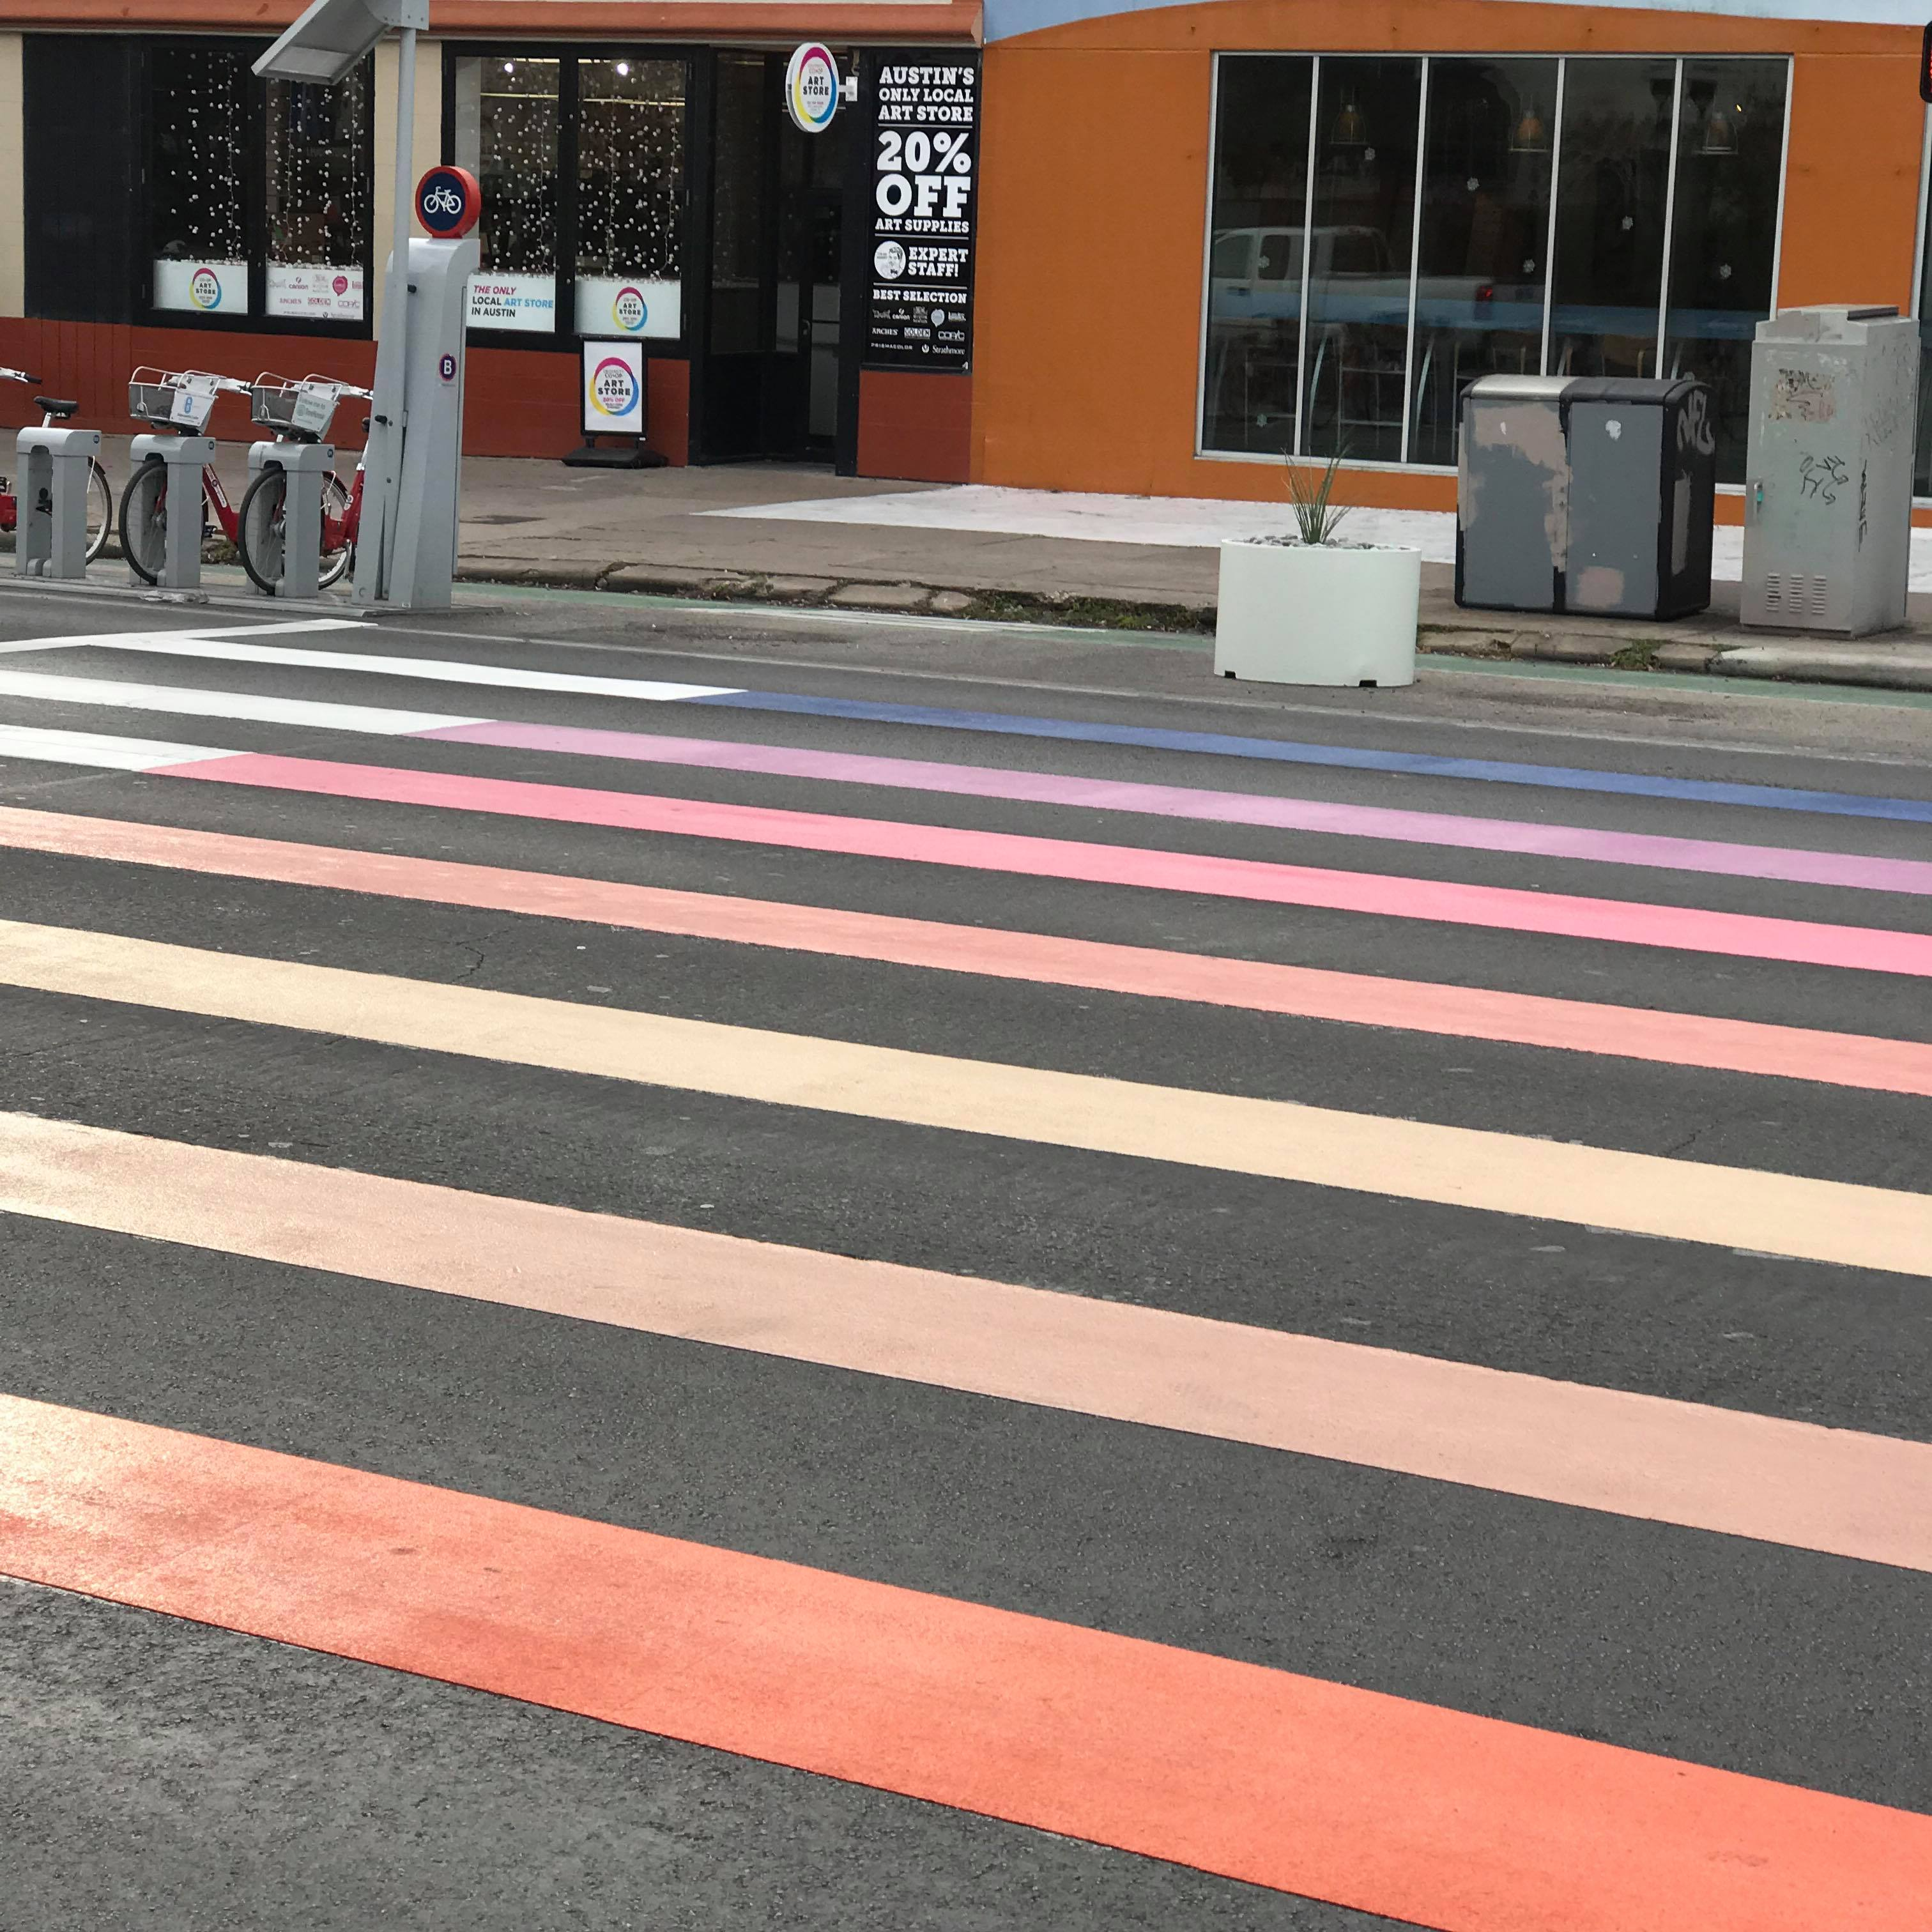 Colorful stripes (not a rainbow) on a street crosswalk